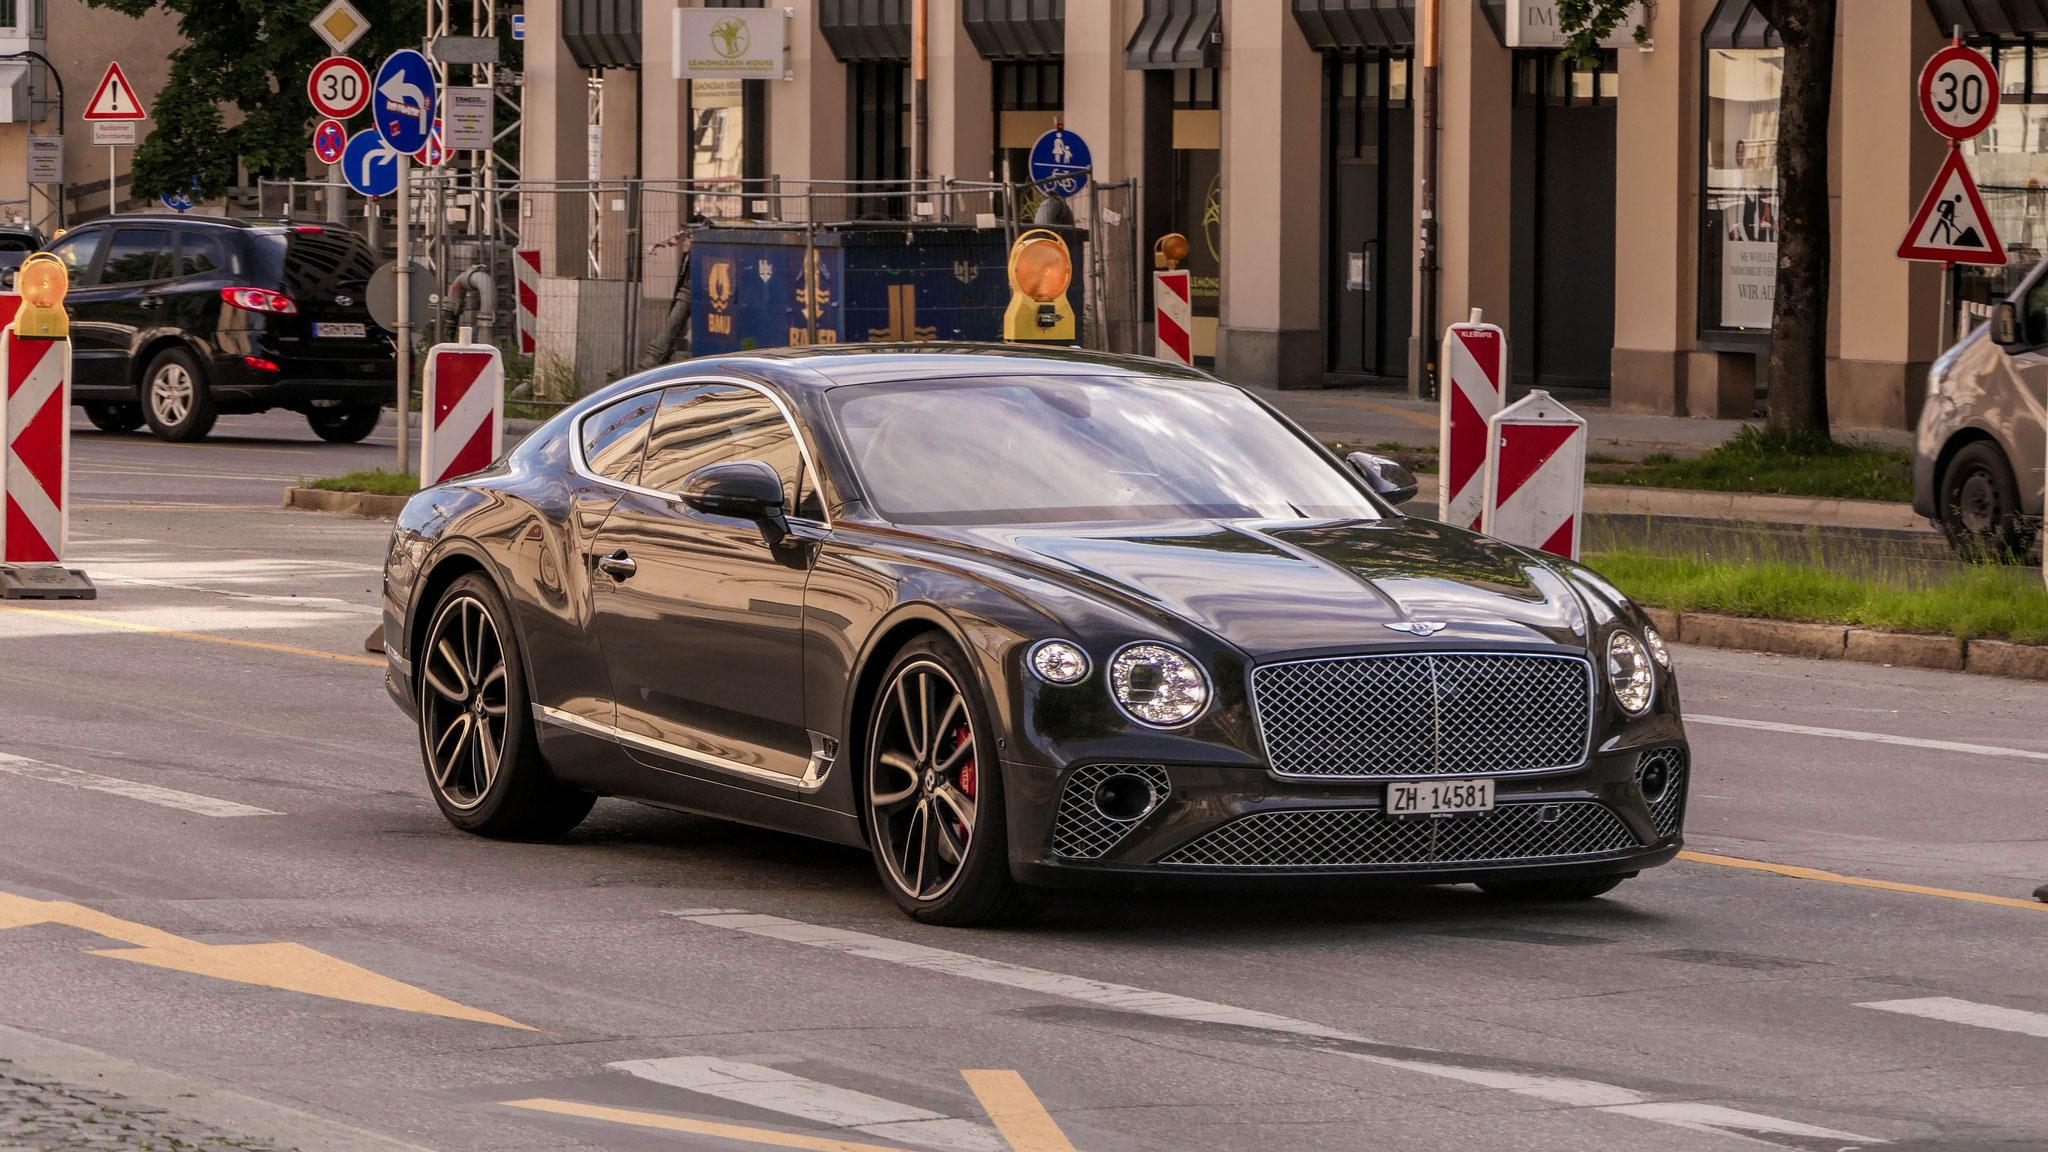 Bentley Continental GT - ZH-14581 (CH)